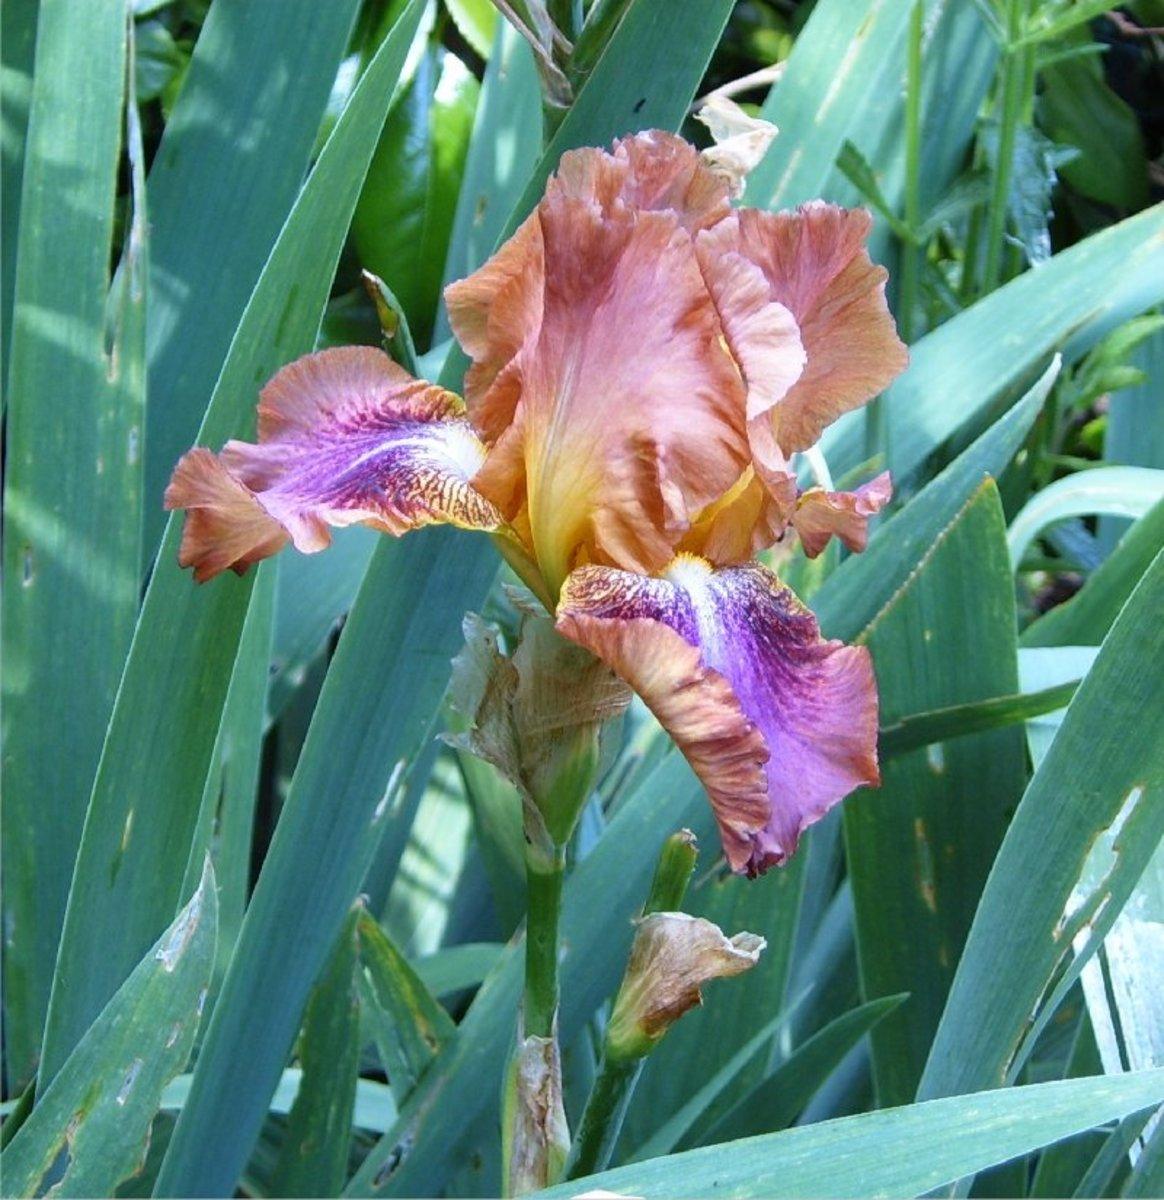 Bearded Iris.  Photograph by Helen Lush